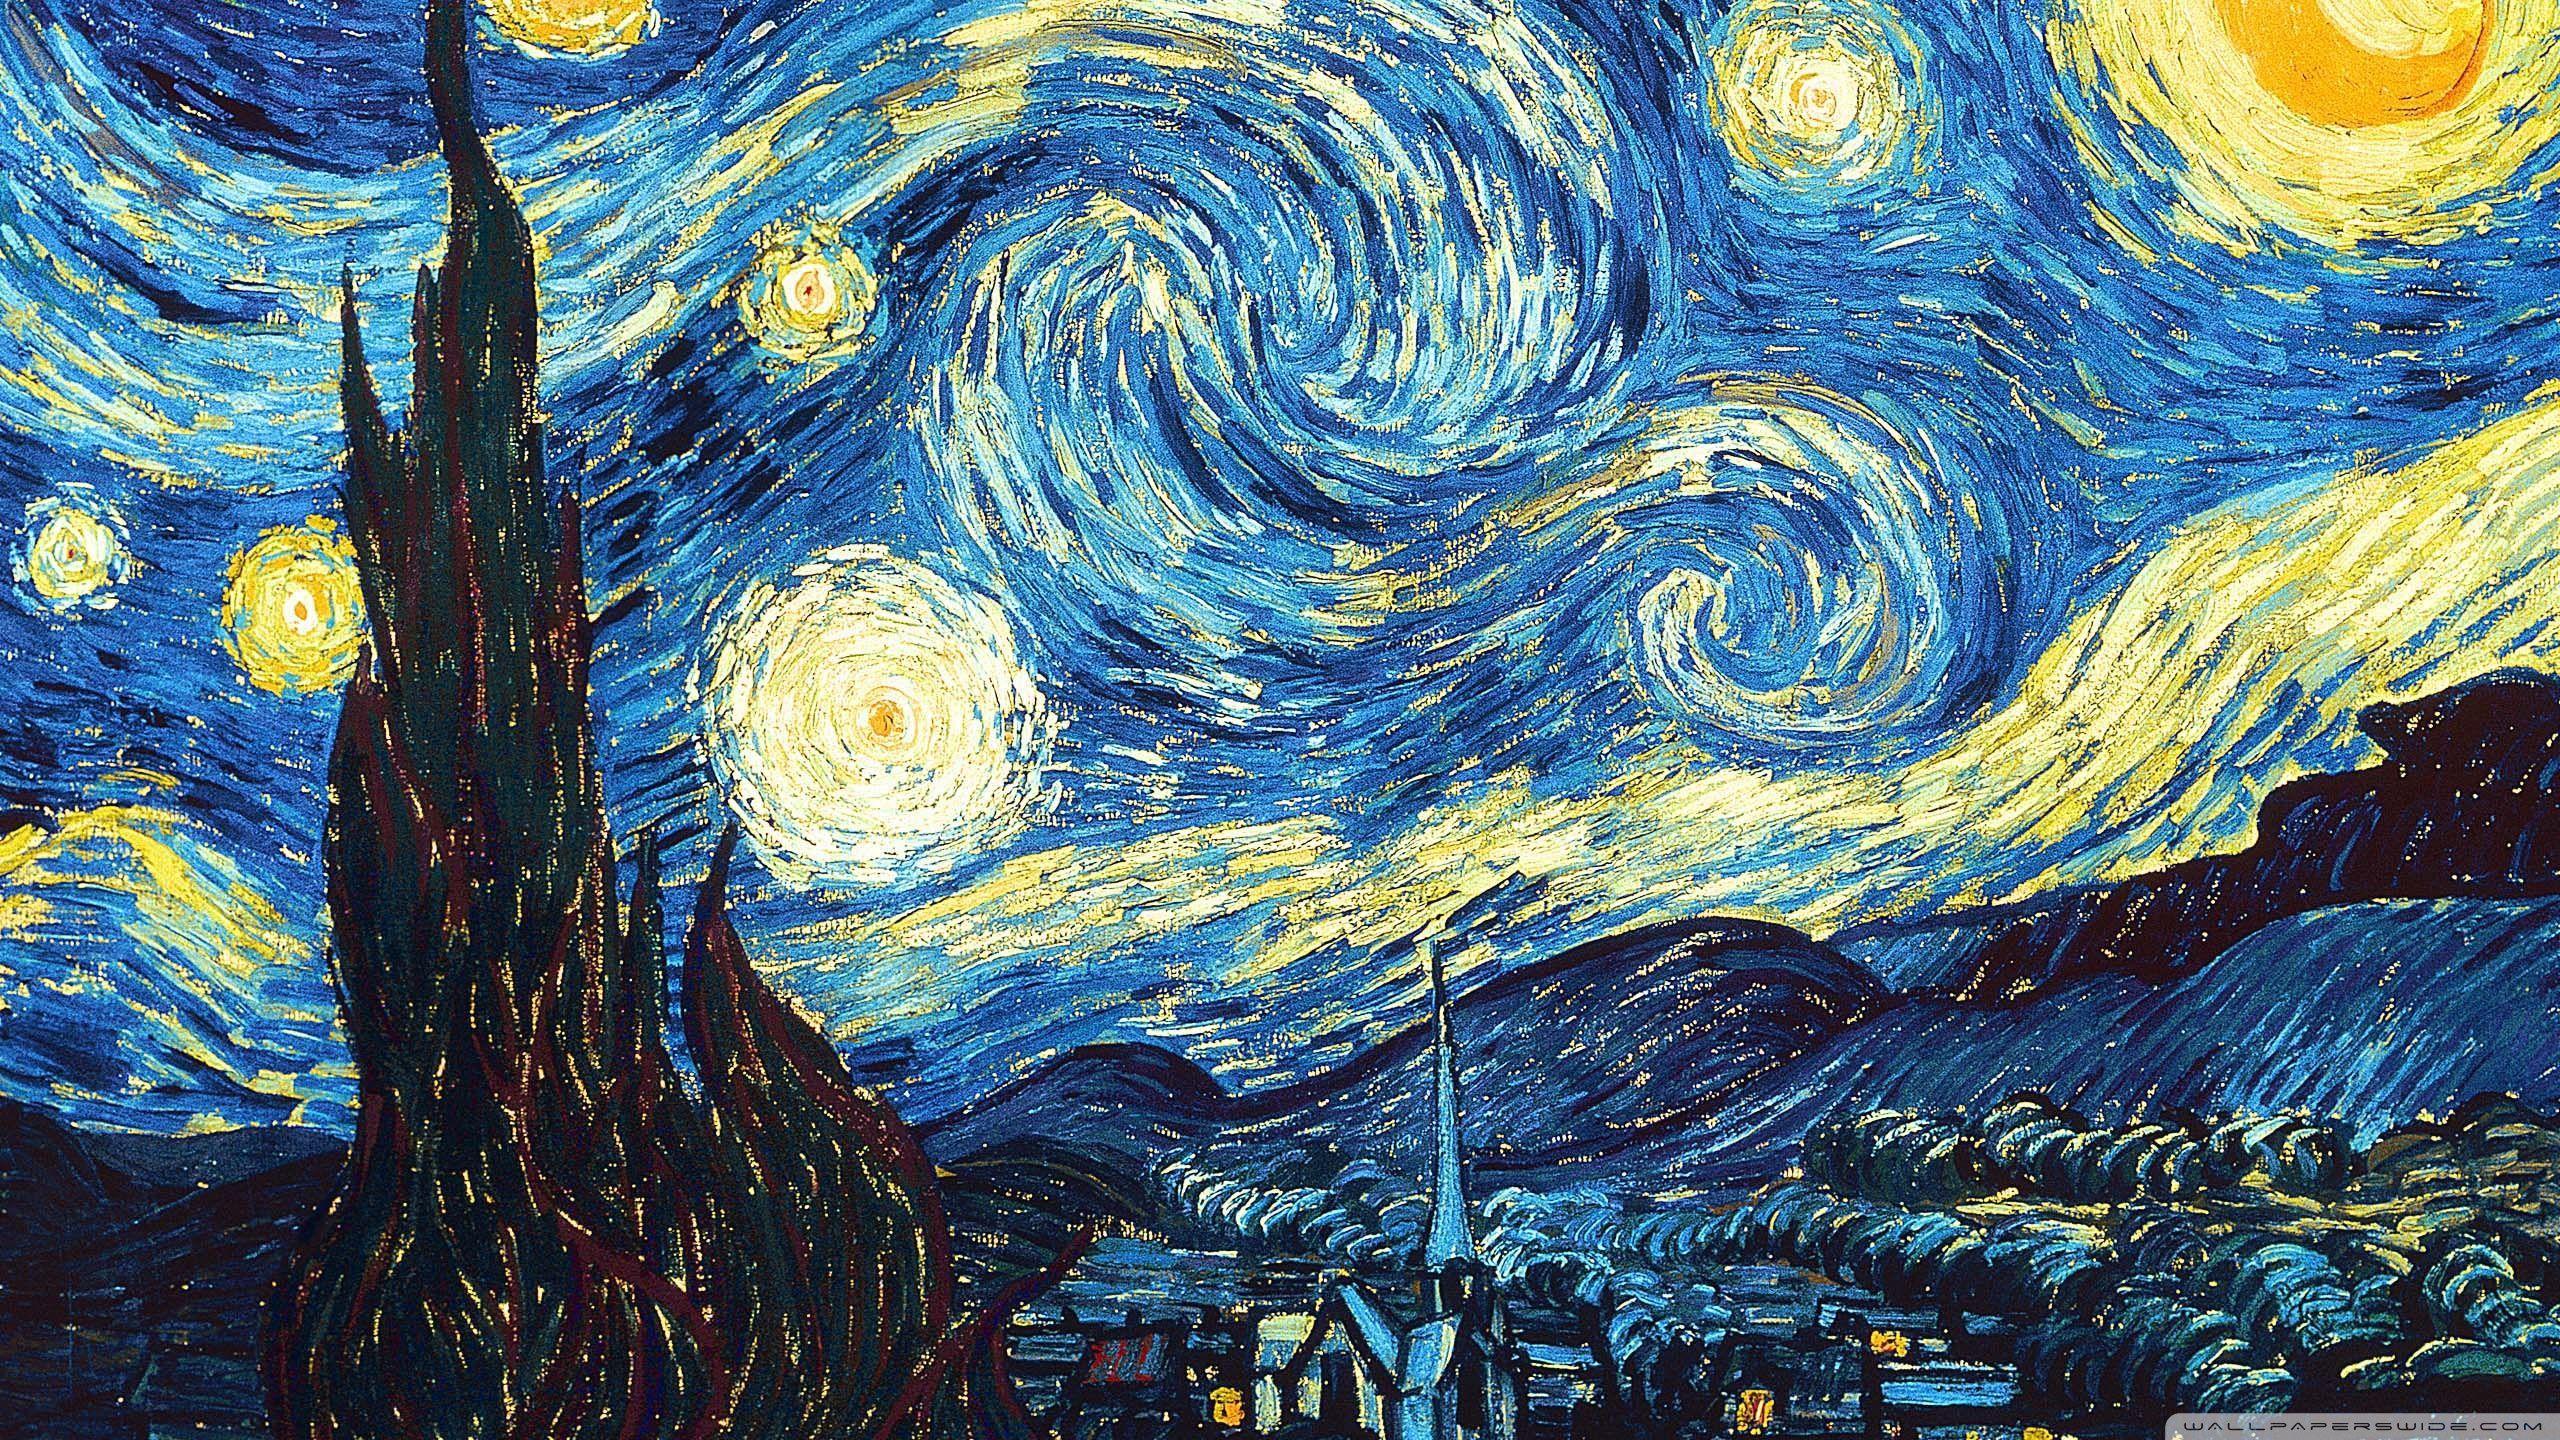 2560x1440 The Starry Night 4k Hd Desktop Wallpaper For 4k Ultra Hd Tv Starry Night Van Gogh Starry Night Wallpaper Van Gogh Paintings